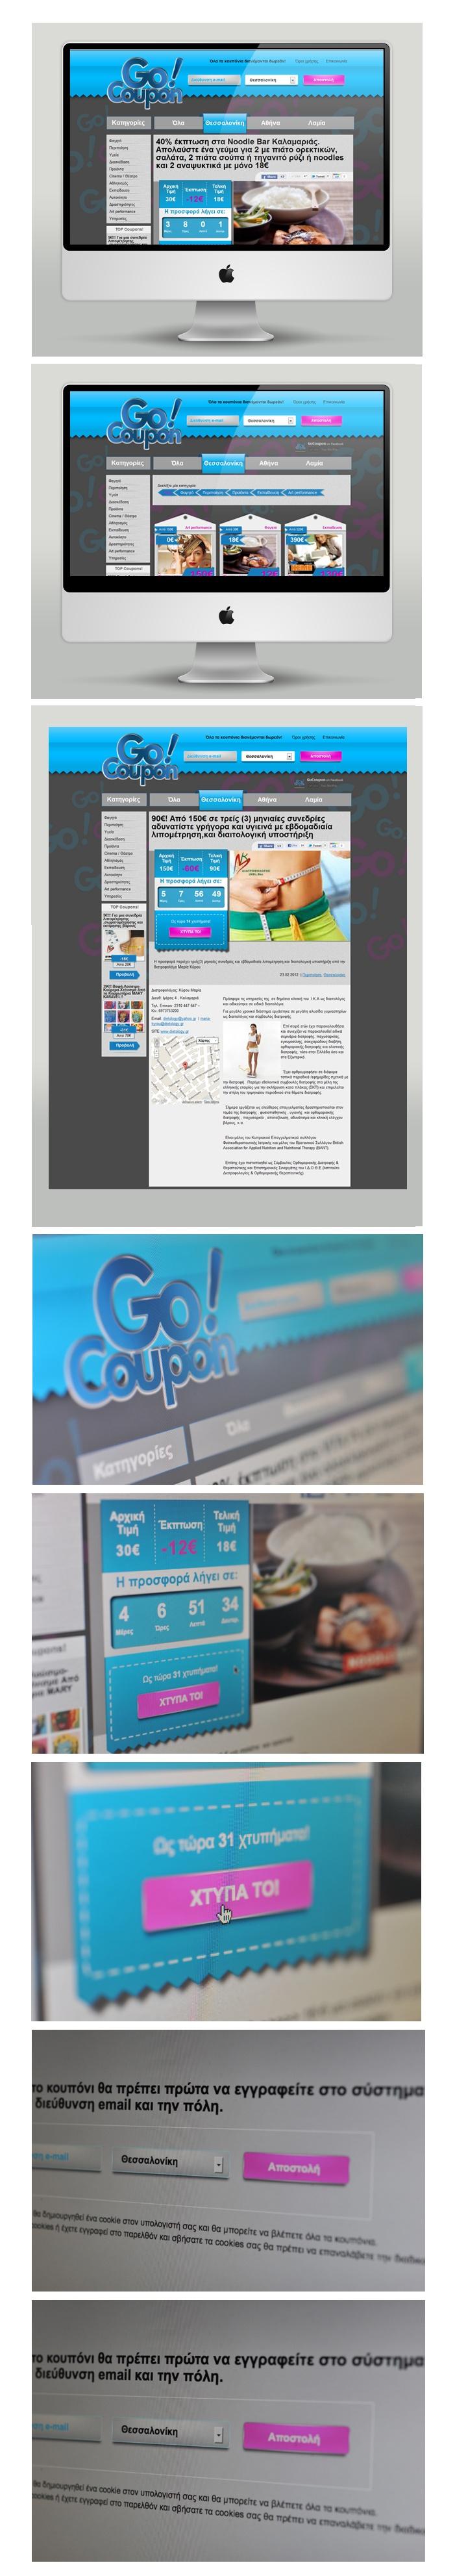 http://bnspro.gr/portfolio/go-coupon